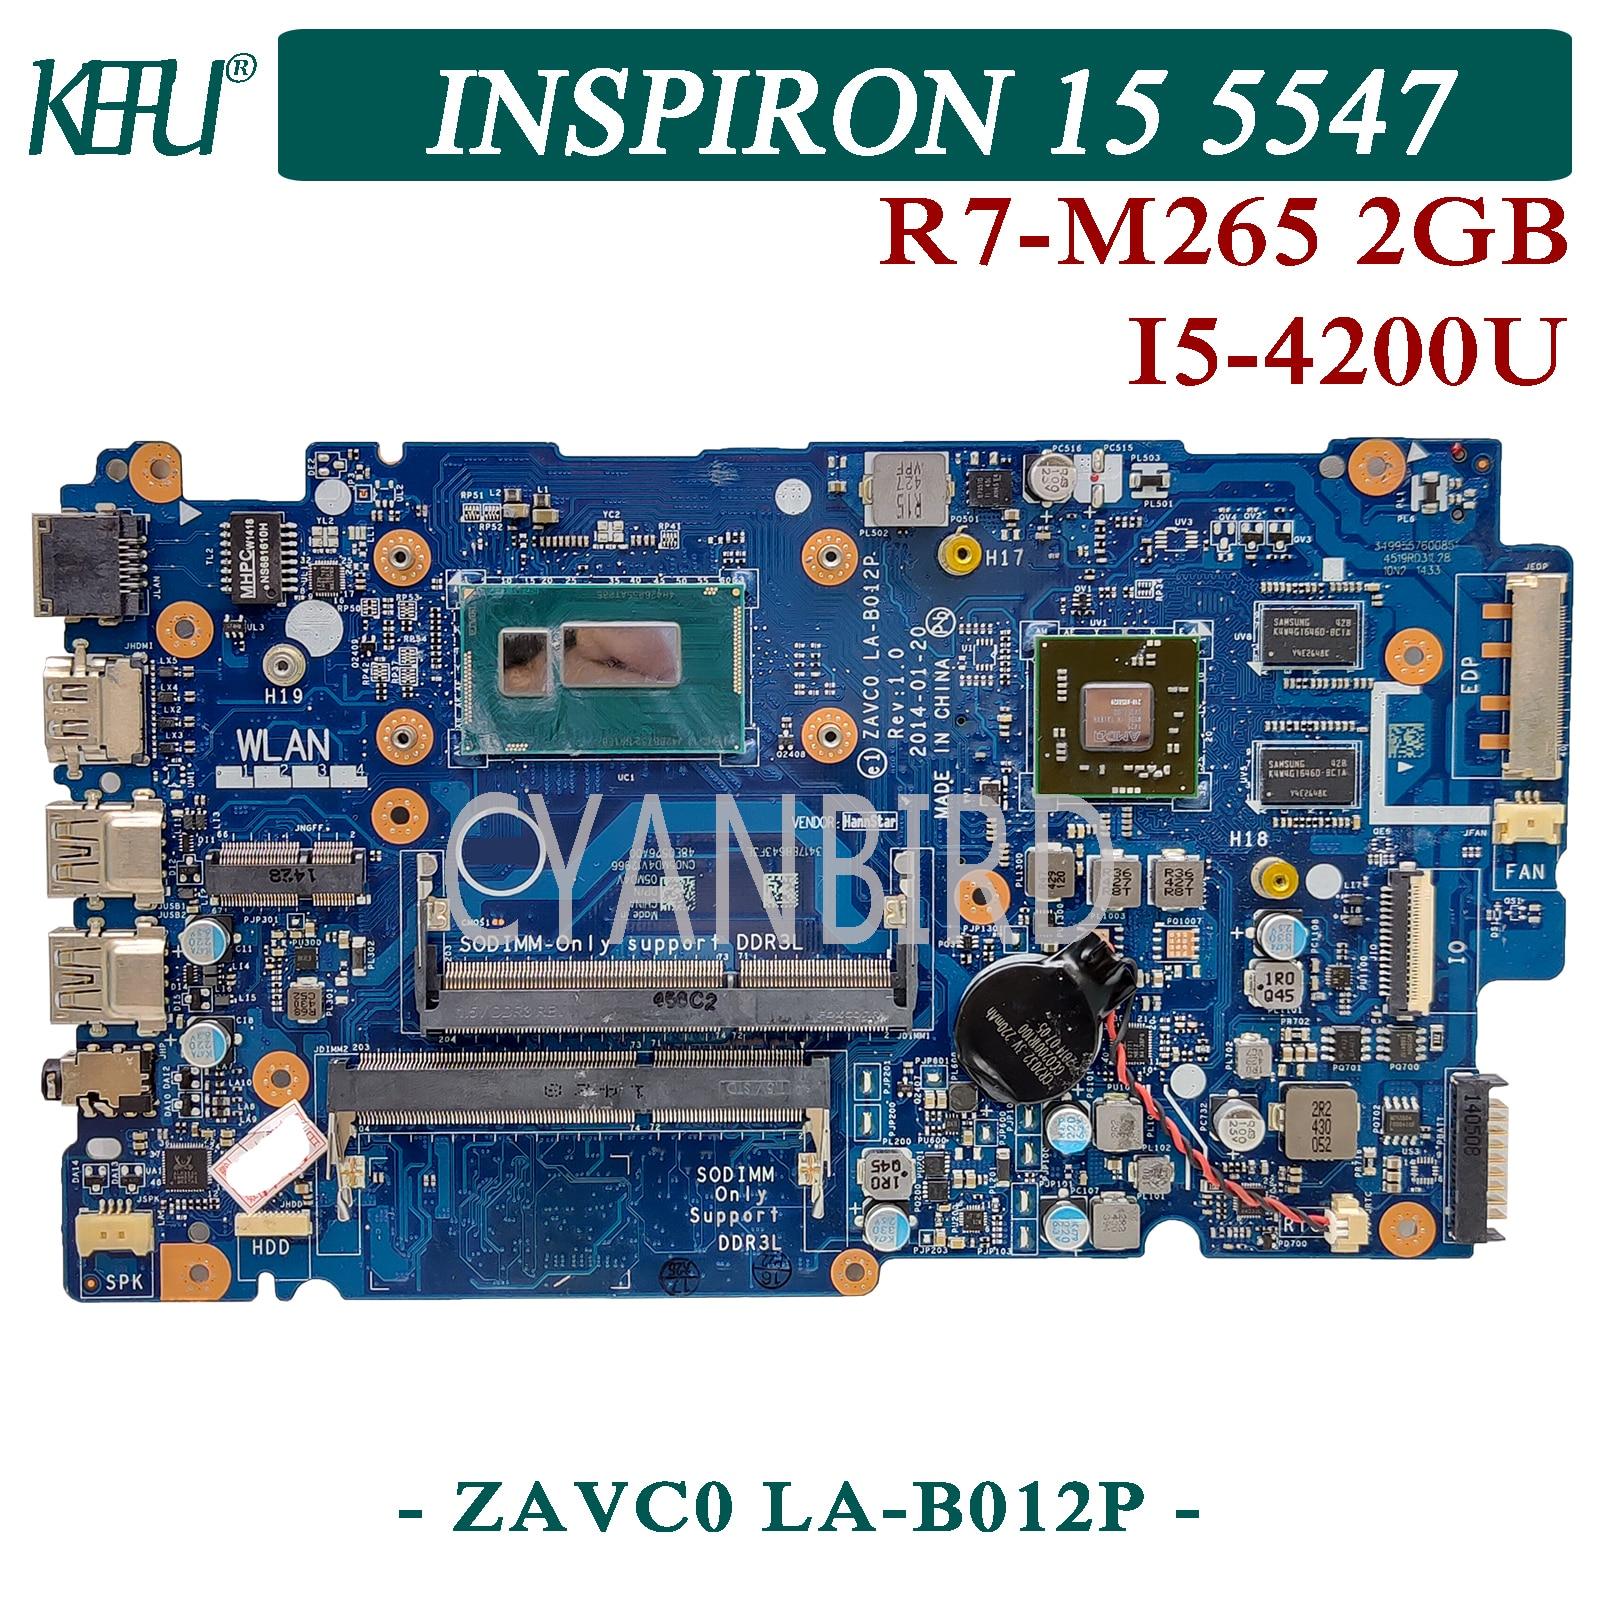 KEFU ZAVC0 LA-B012P اللوحة الرئيسية الأصلية لديل انسبايرون 15-5547 14-5447 مع I5-4200U اللوحة الأم R7-M265 2 جيجابايت